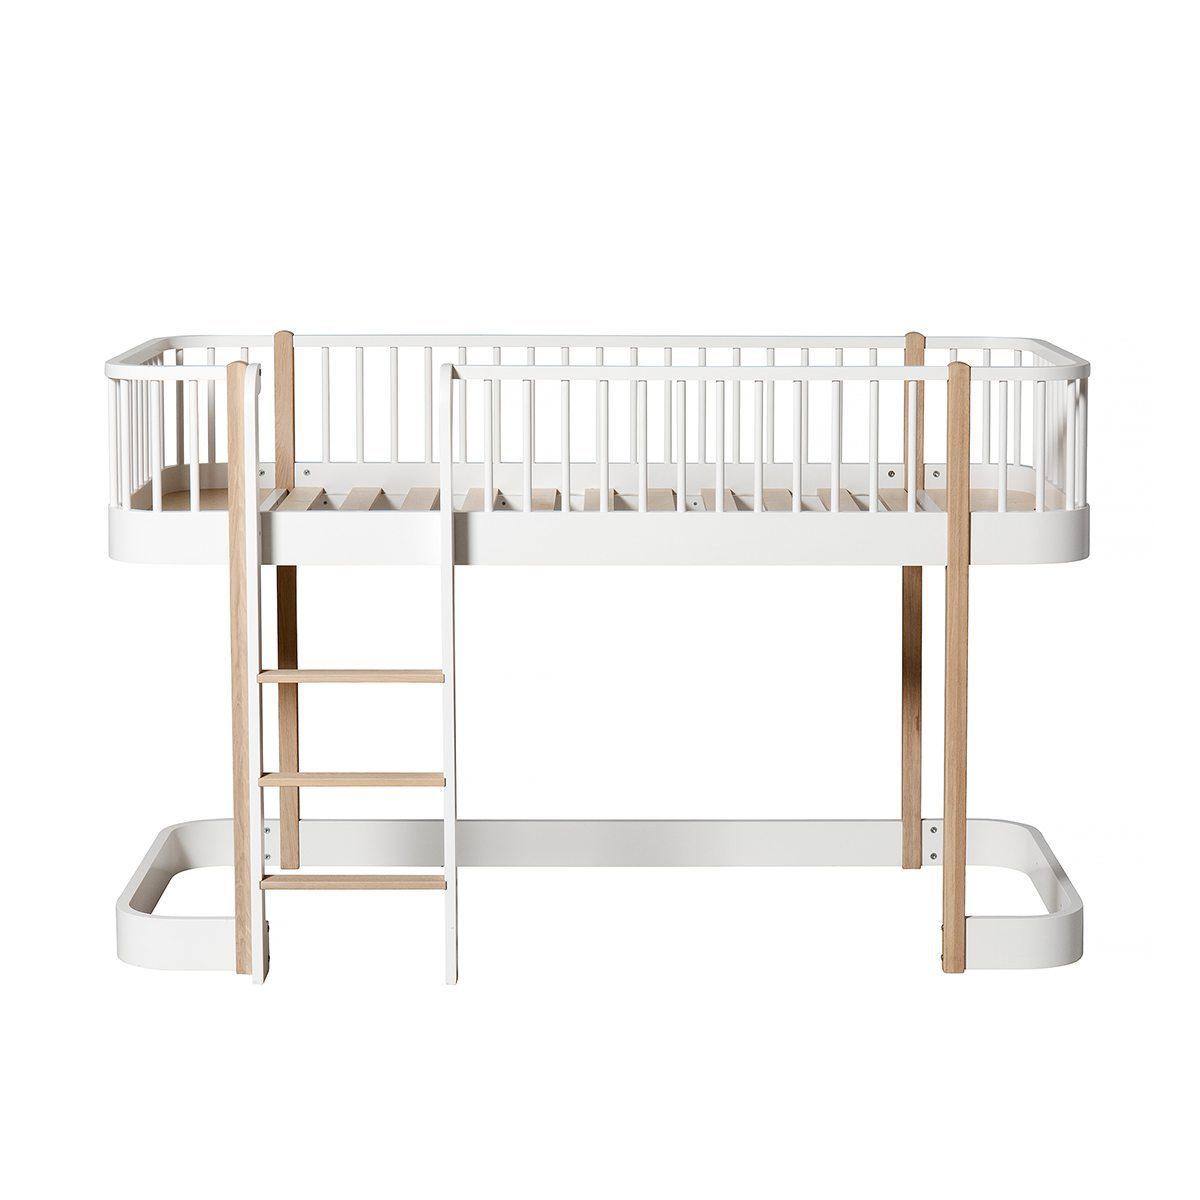 Oliver Furniture – Wood Original Low Loft Bed – Wit/Eikenhout, 90 x 200 cm